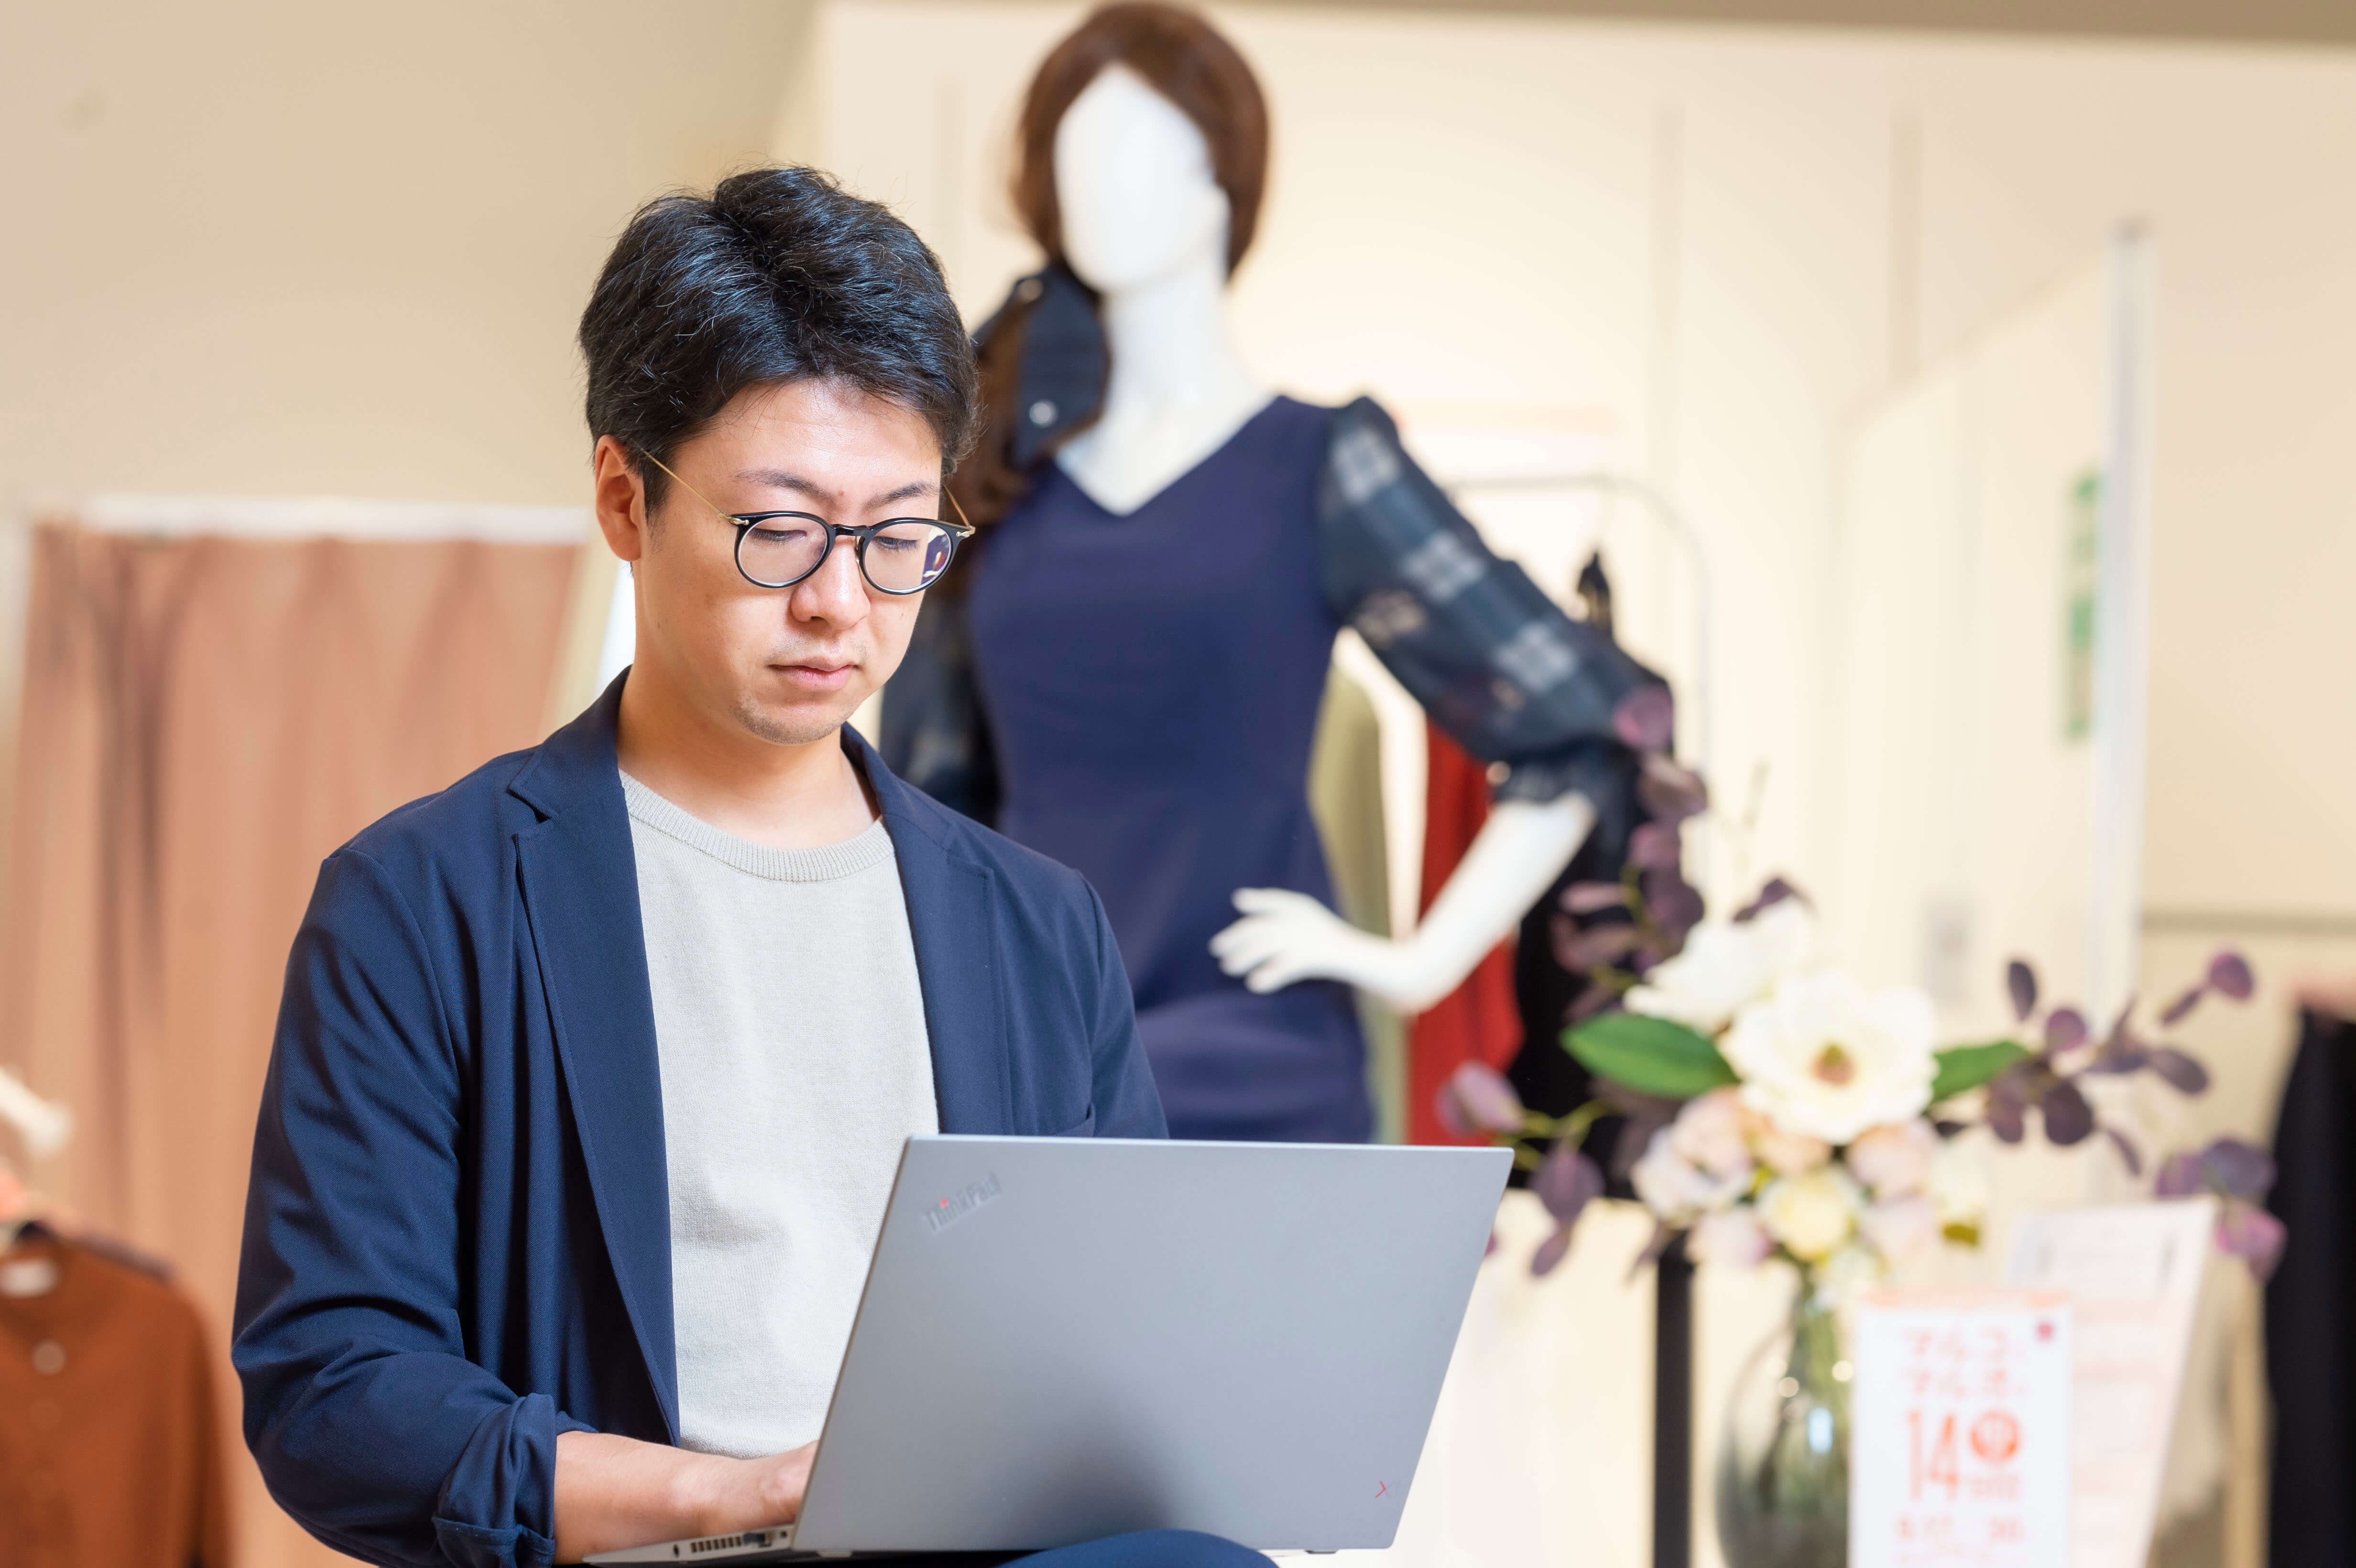 EC事業責任者|ファッションD2CブランドのEC企画・運用をお任せします!のカバー写真